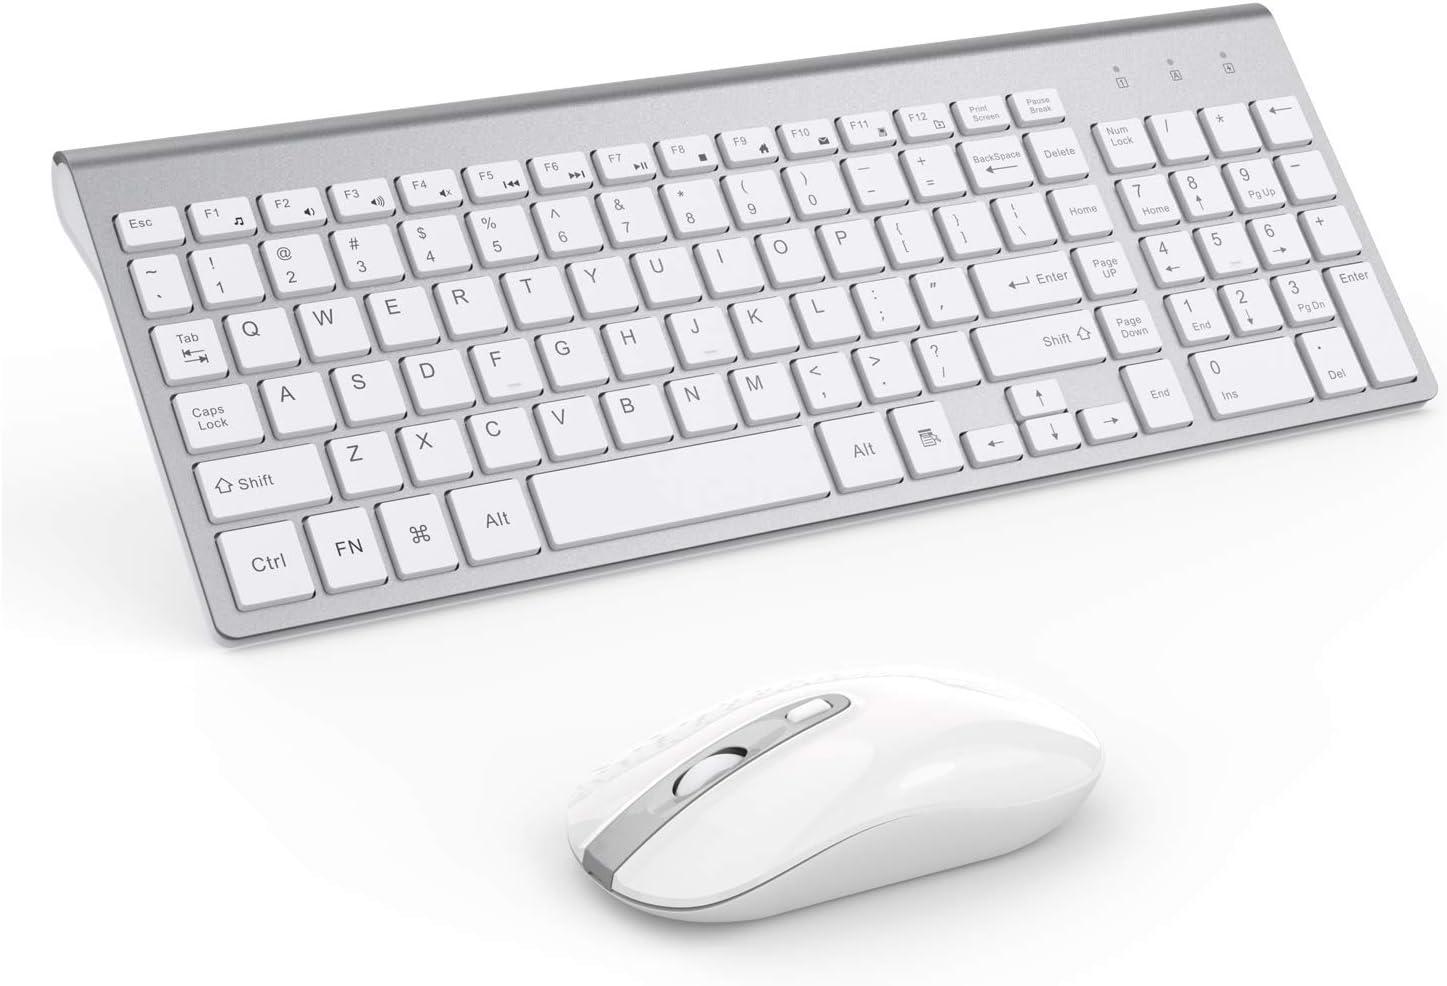 PC Computer Cimetech Compact Full Size Wireless Keyboard and Mouse Set 2.4G Ultra-Thin Sleek Design for Windows Wireless Keyboard Mouse Combo Purple Desktop Notebook -